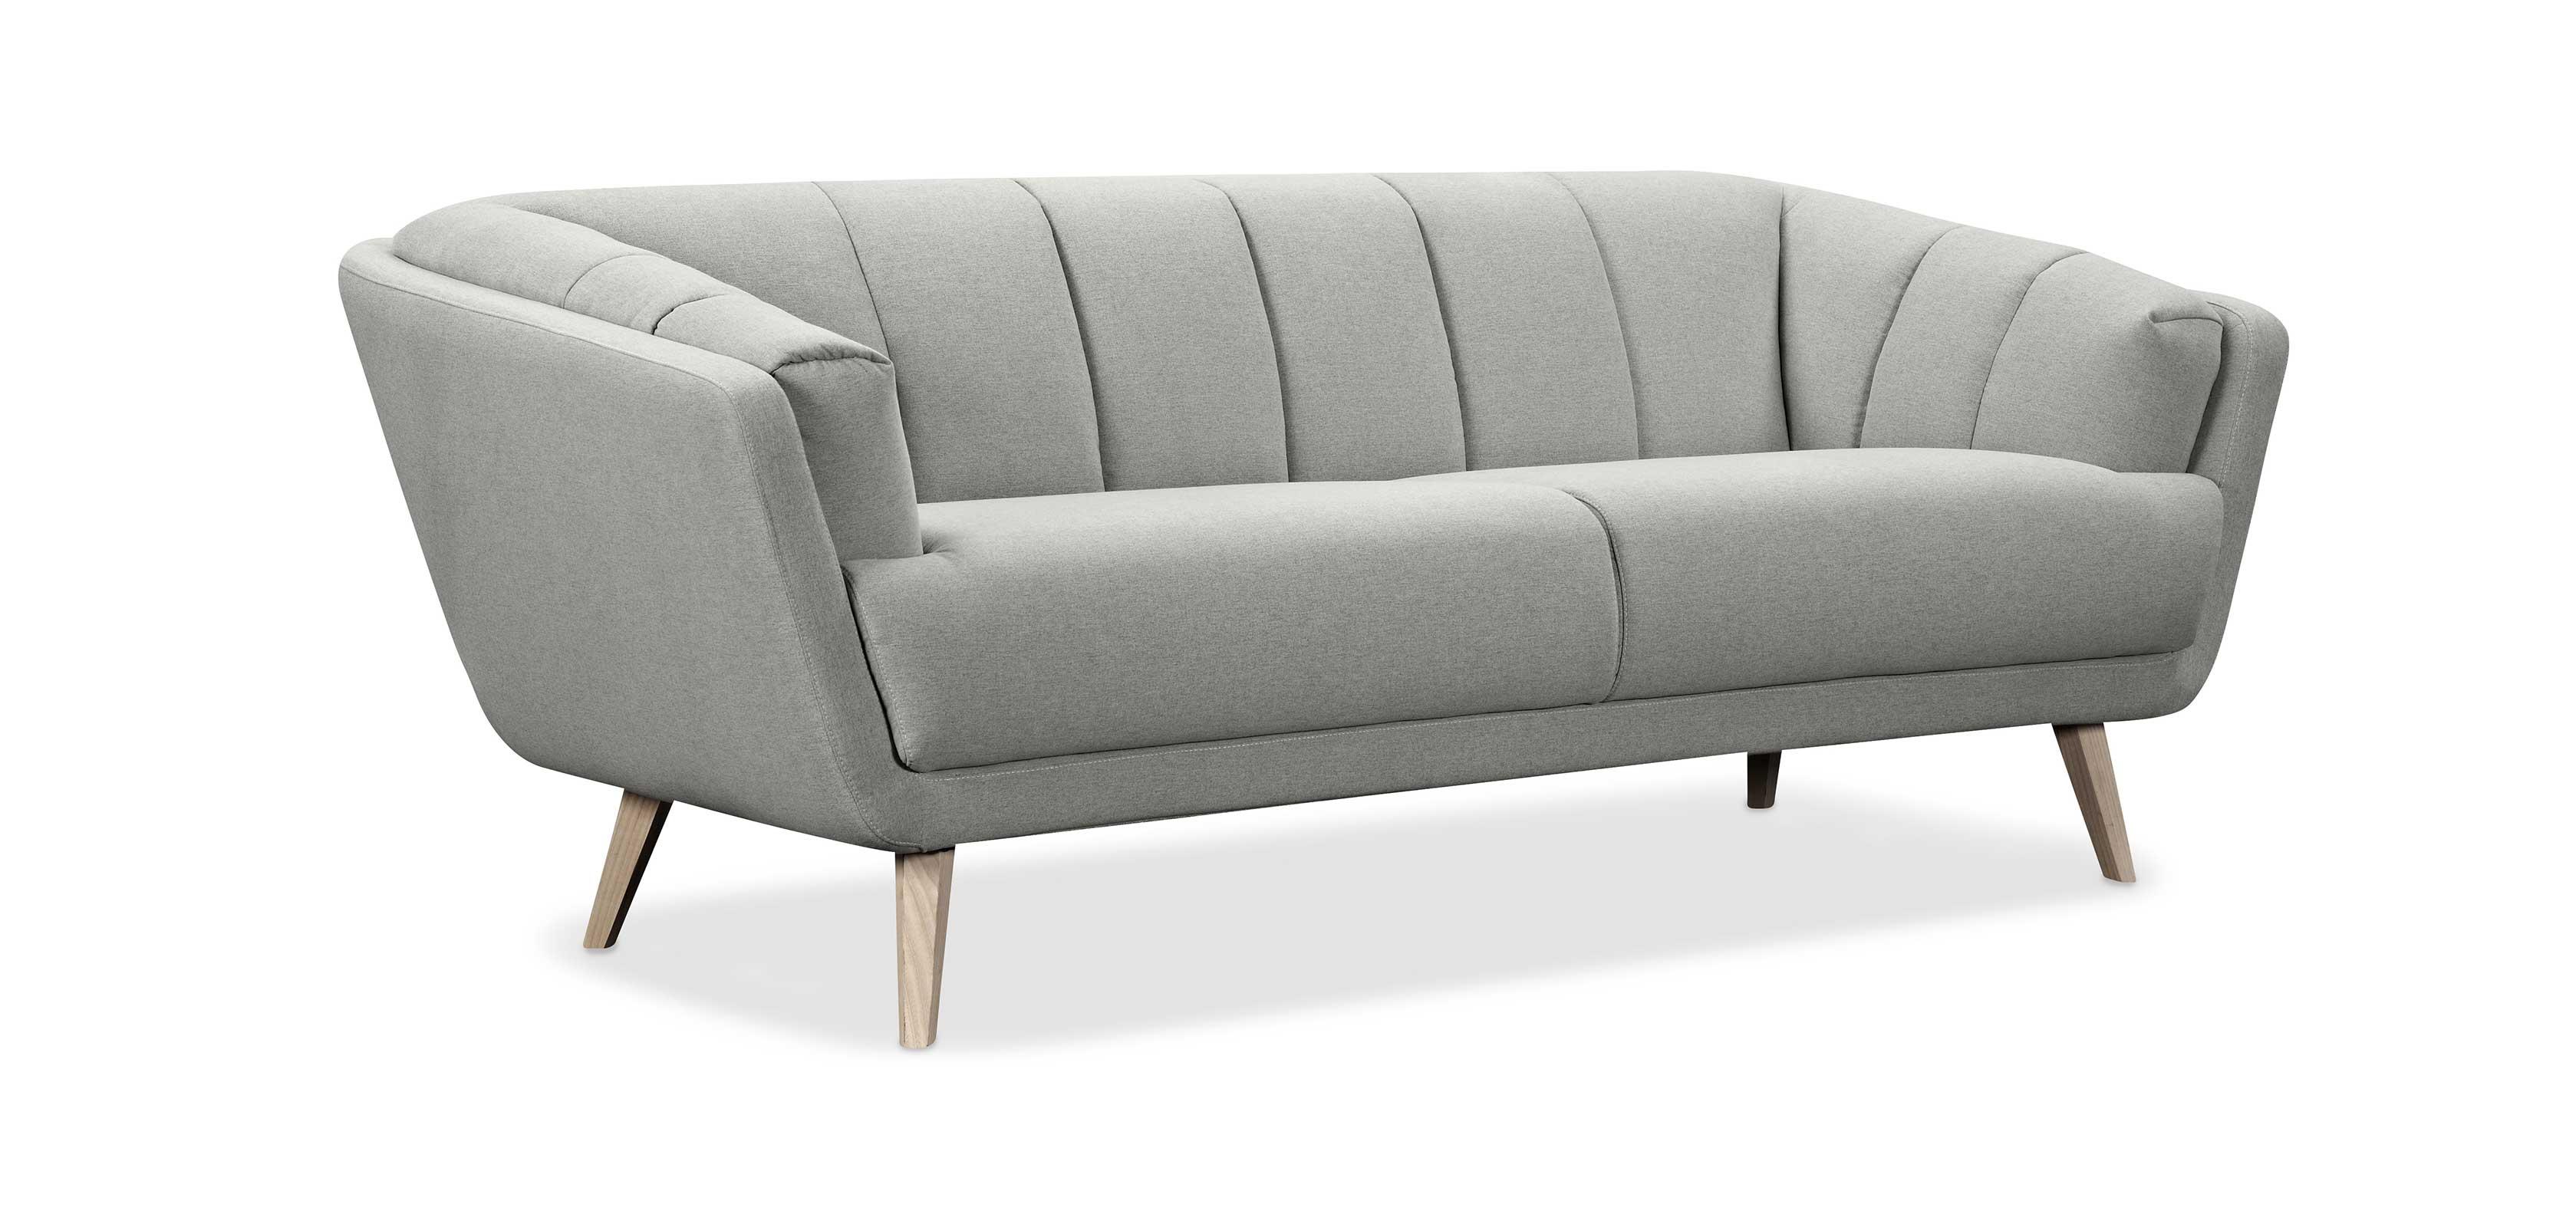 scandinavian sofas uk office sofa set india style two tone 3